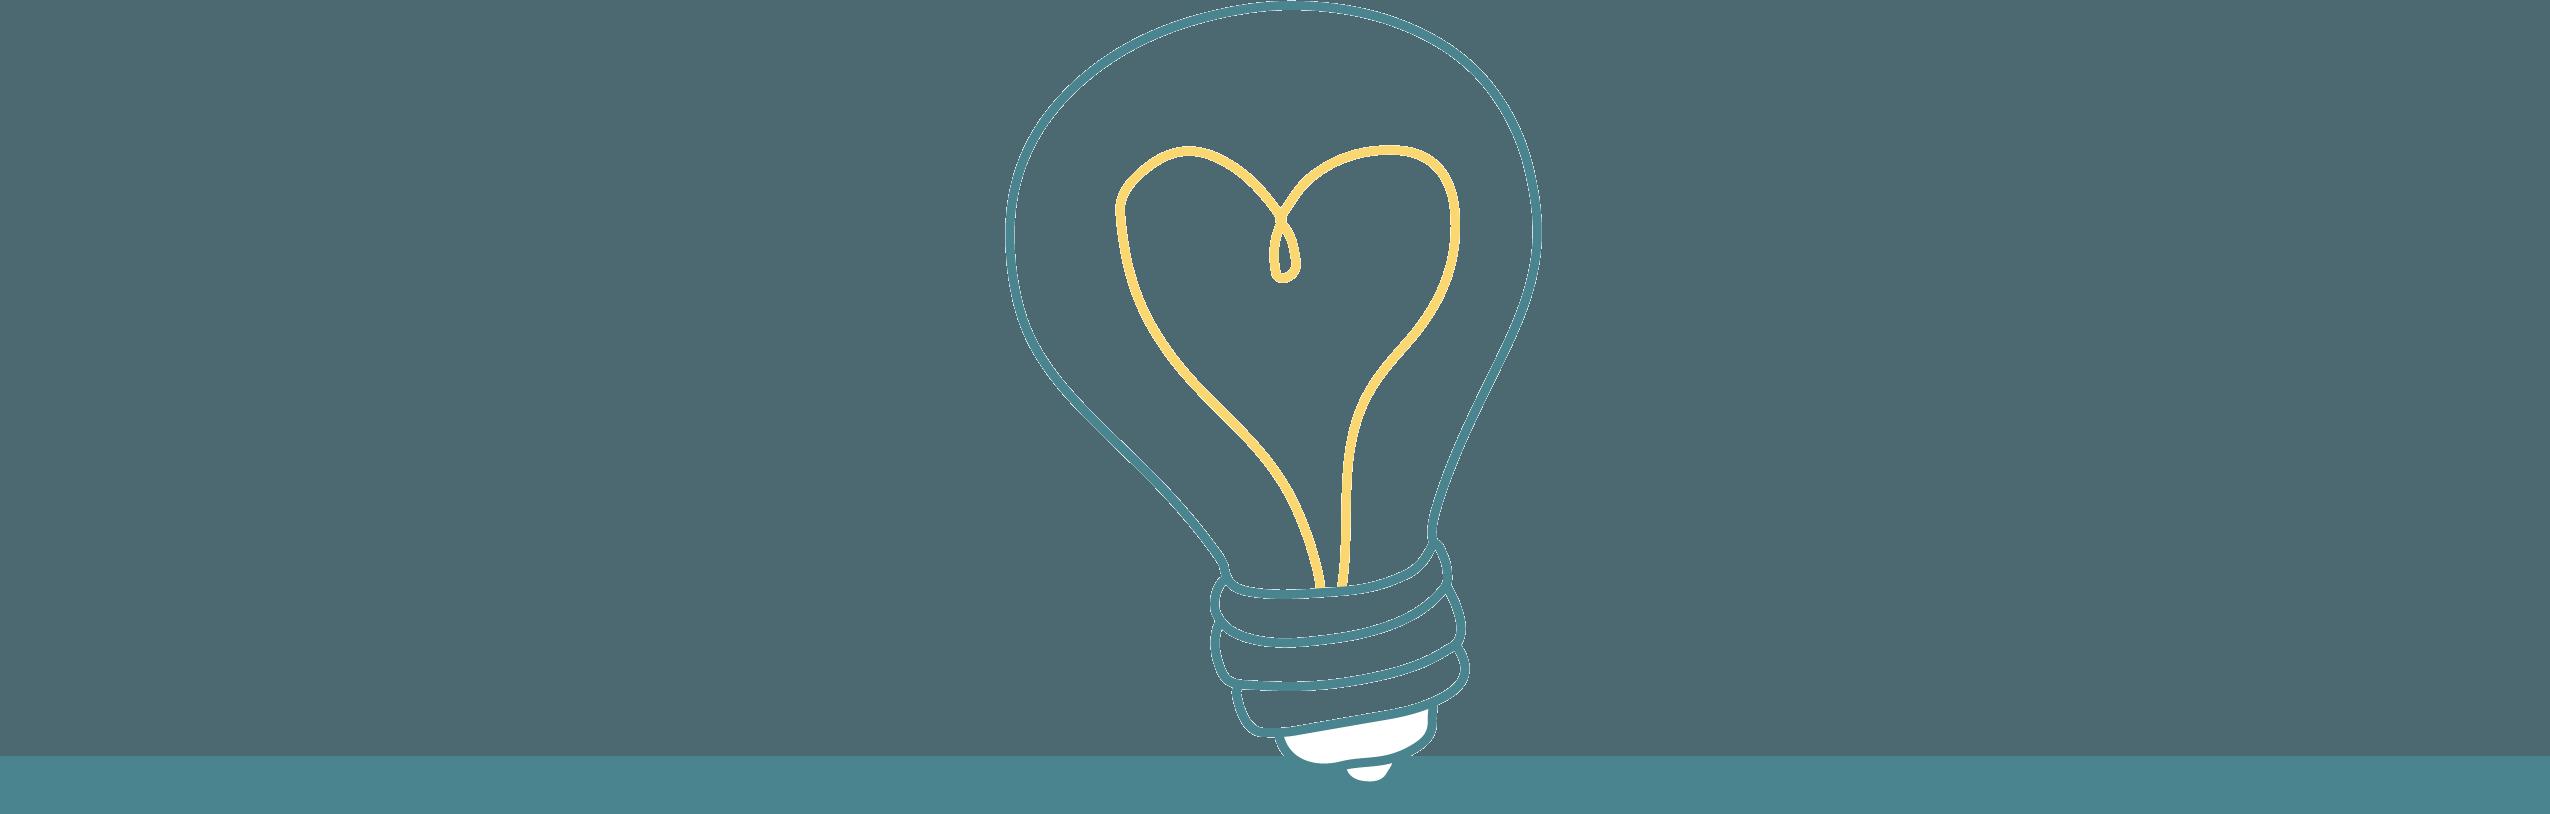 lightbulb icon header